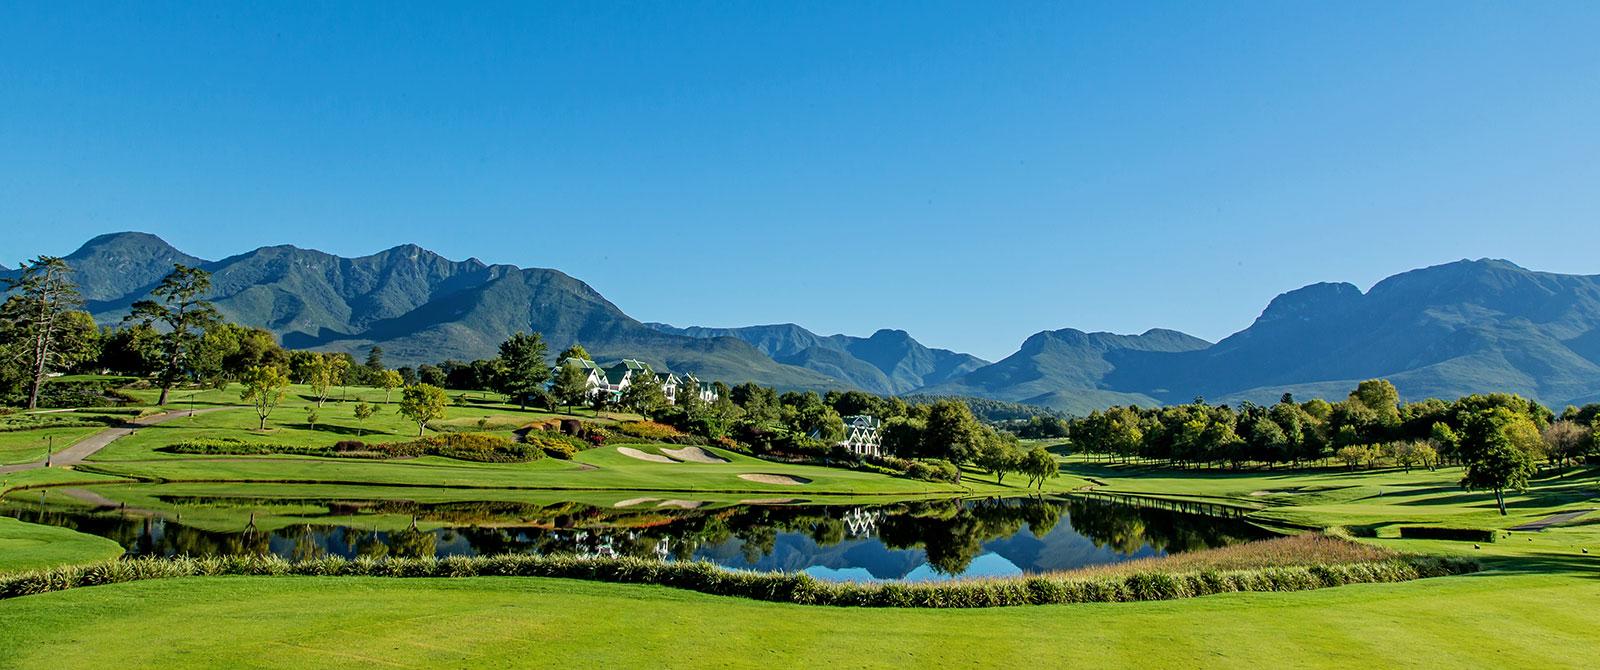 Montagu Golf Course - Fancourt Resort South Africa